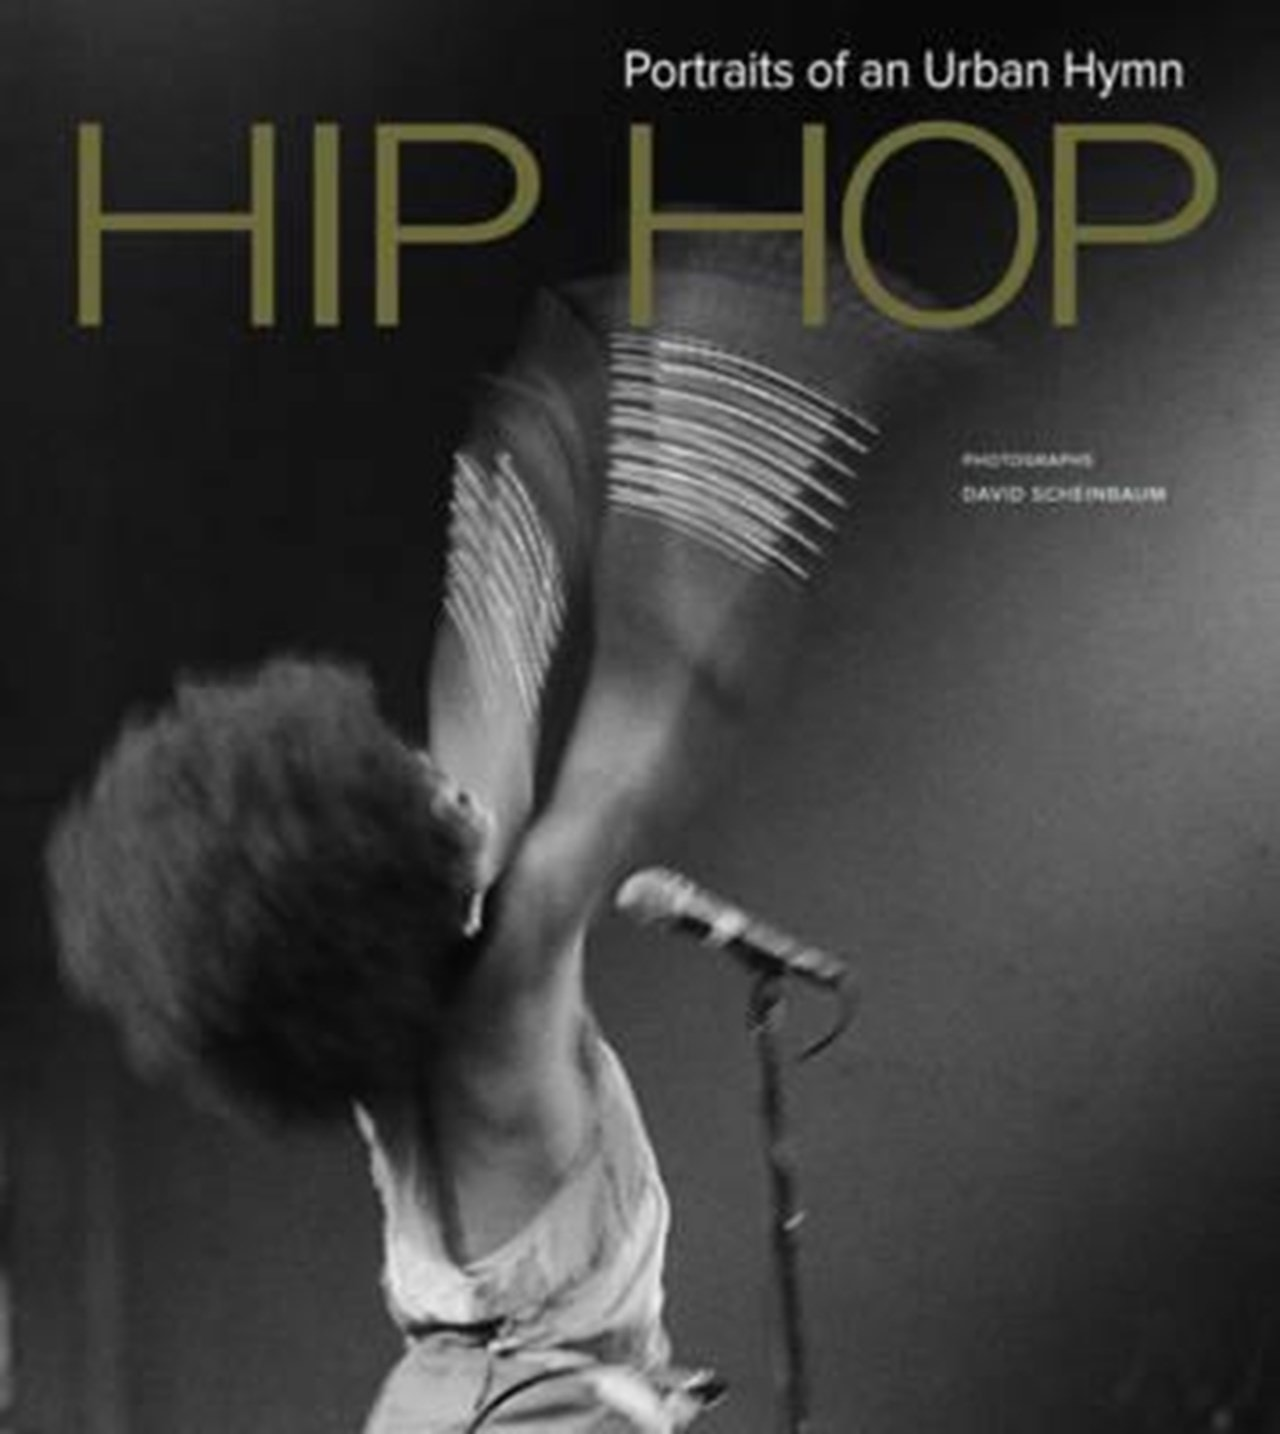 Hip Hop - Portraits Of An Urban Hymn Hardback Book - 1